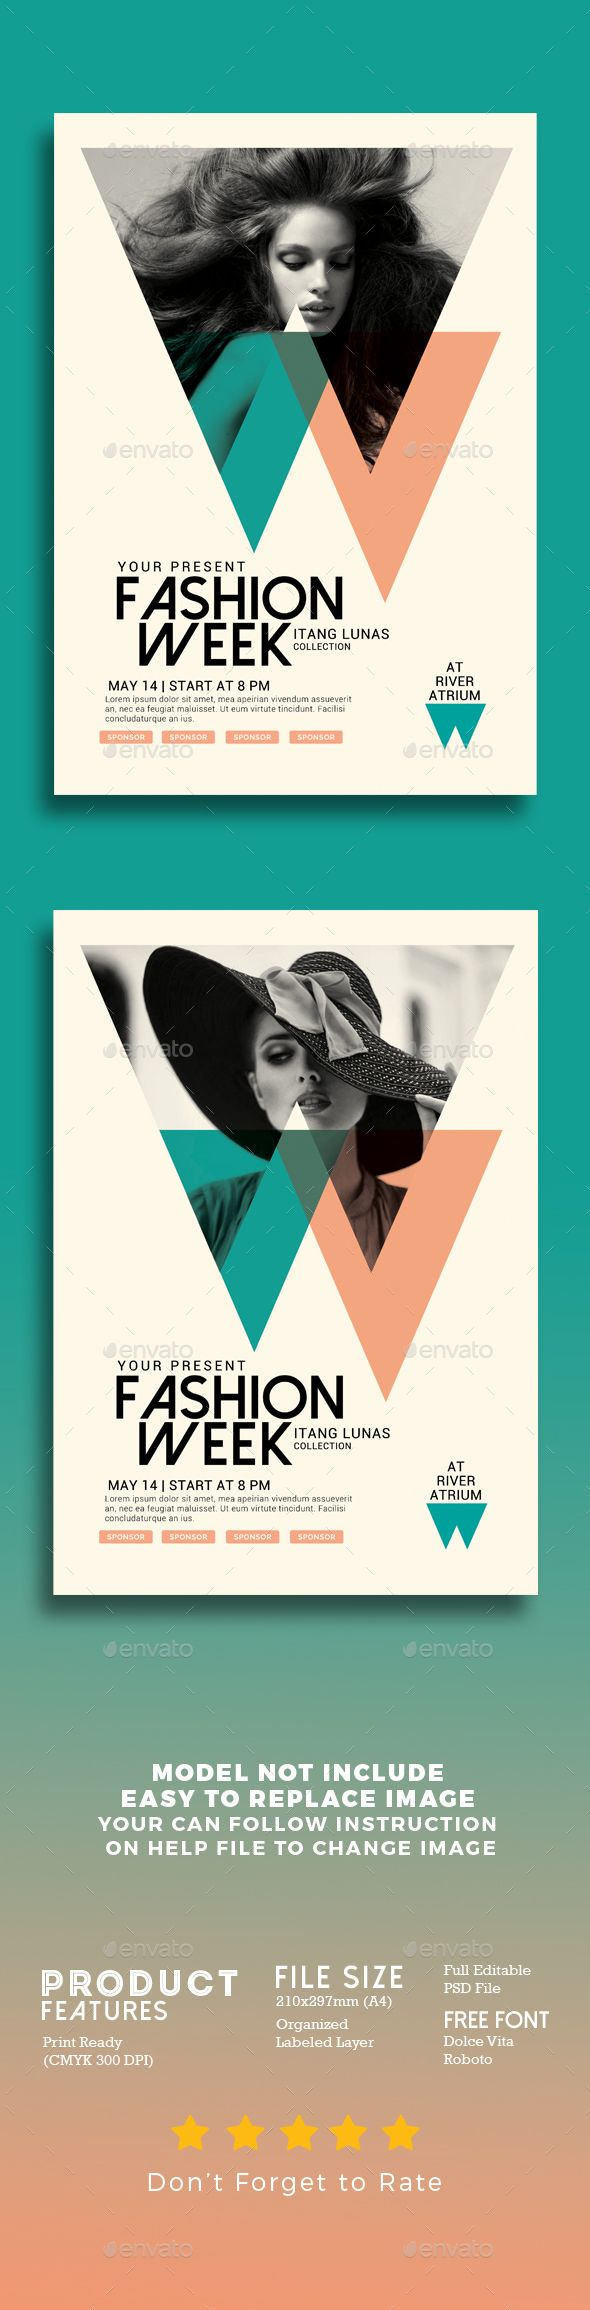 Fashion Week Flyer Template PSD